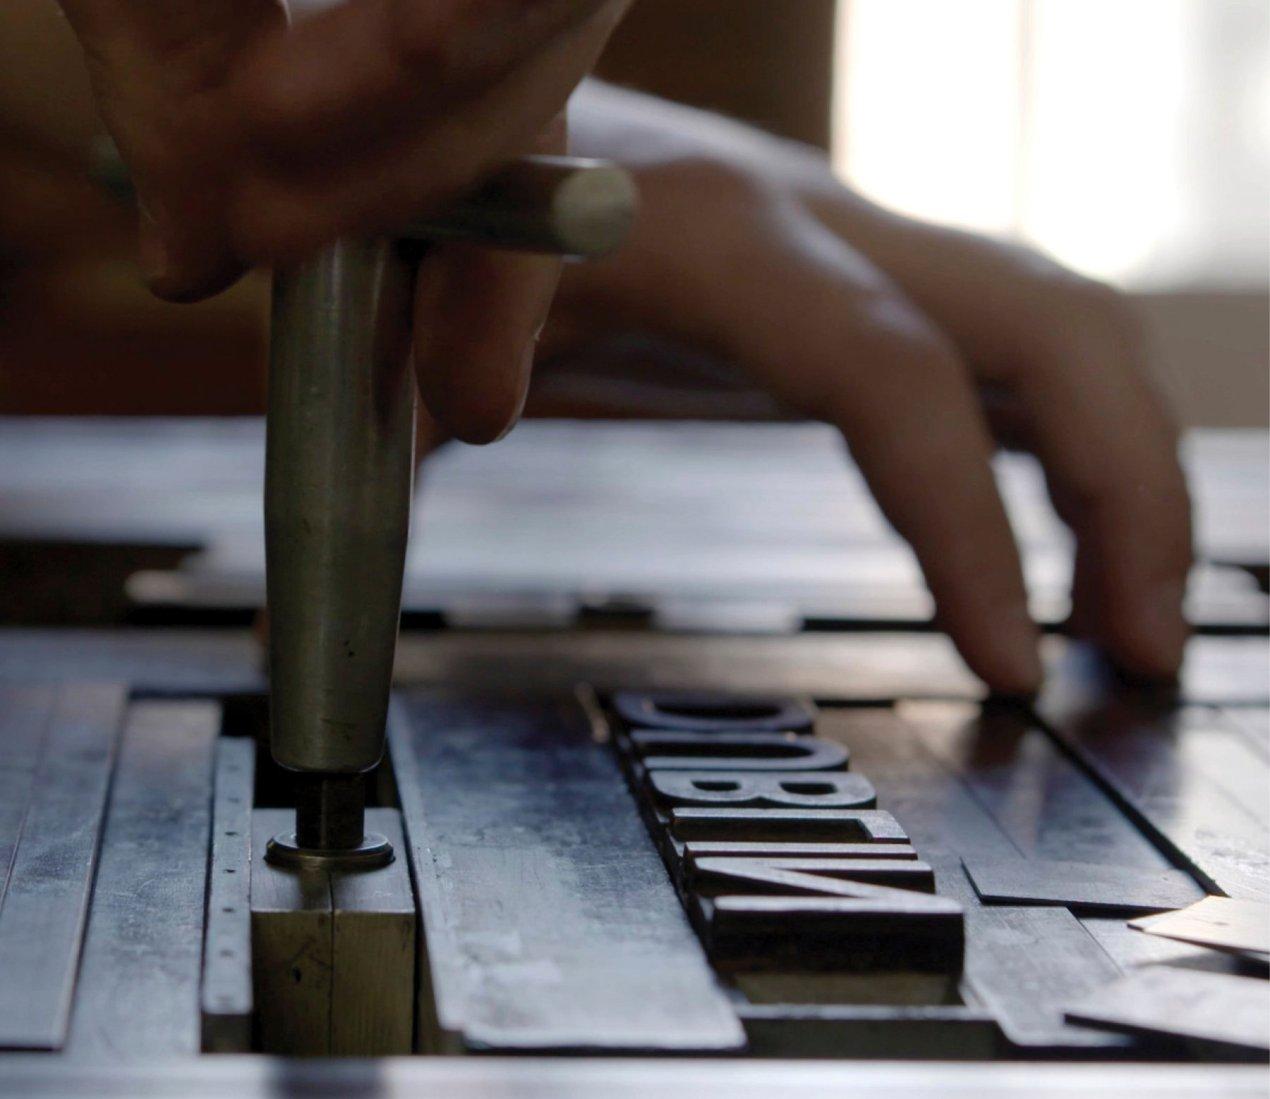 Guinness-identity-7-letterpress-close-up